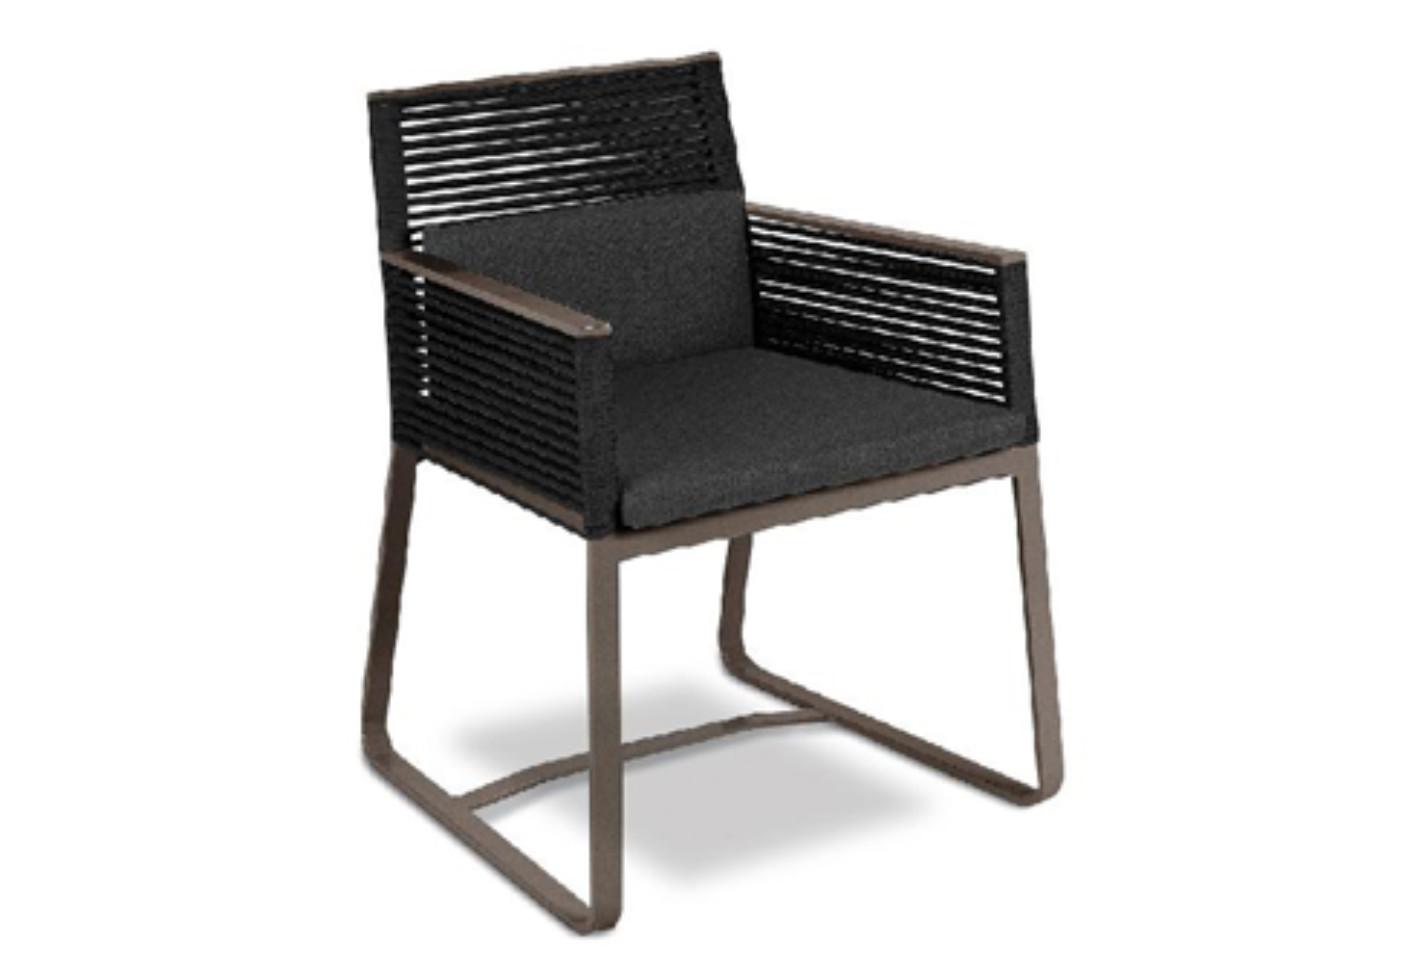 Landscape Chair By Kettal Stylepark